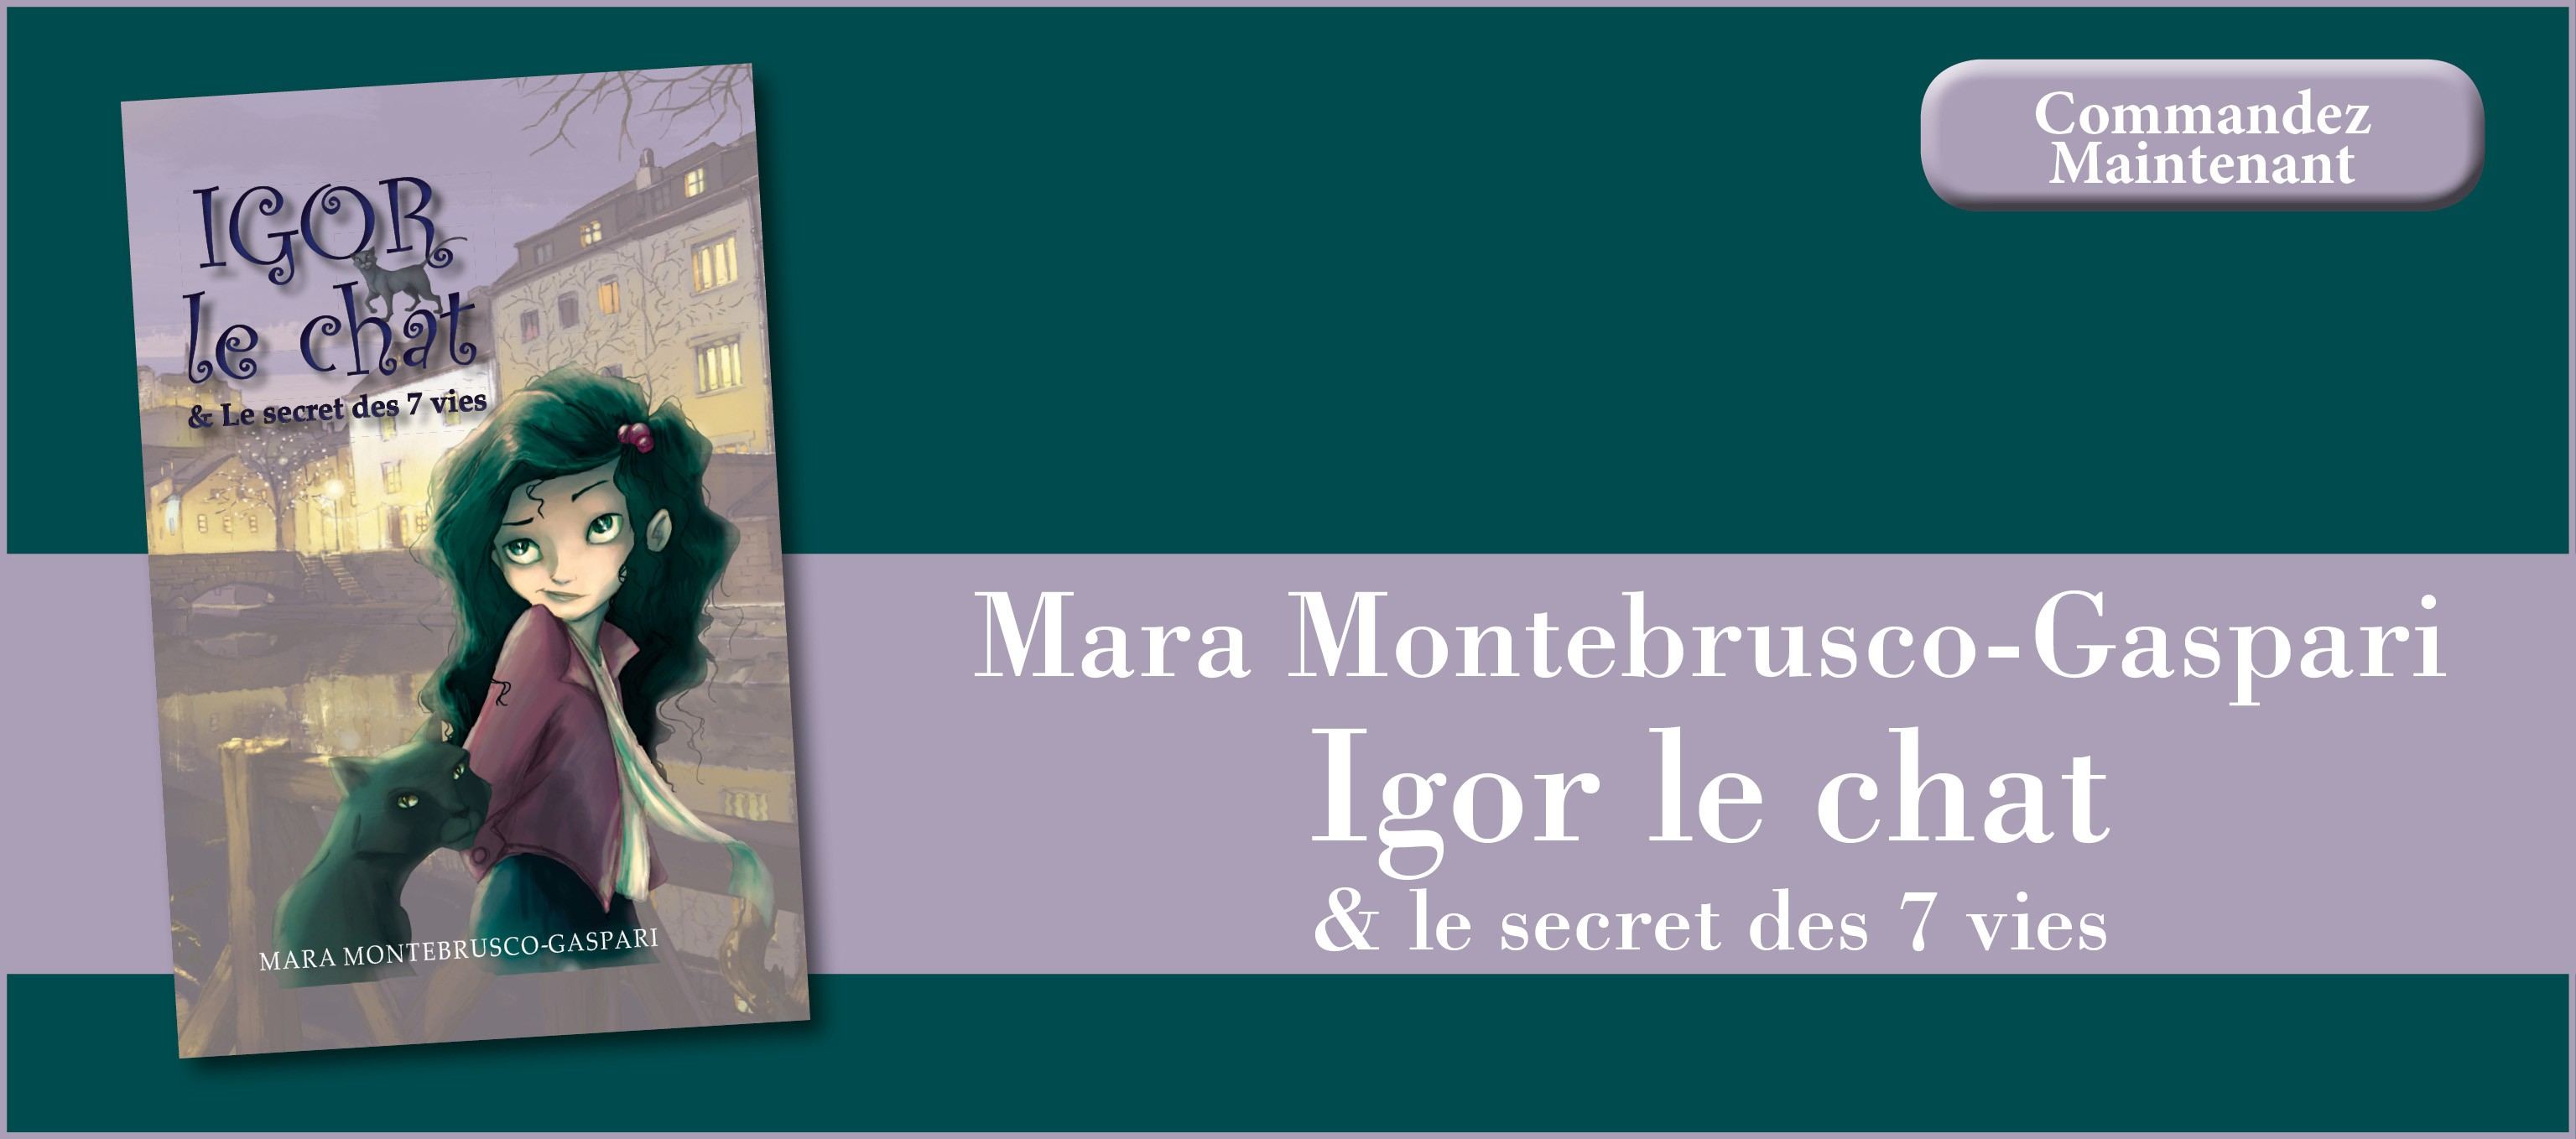 Igor le Chat & le secret des 7 vies - Mara Montebrusco-Gaspari